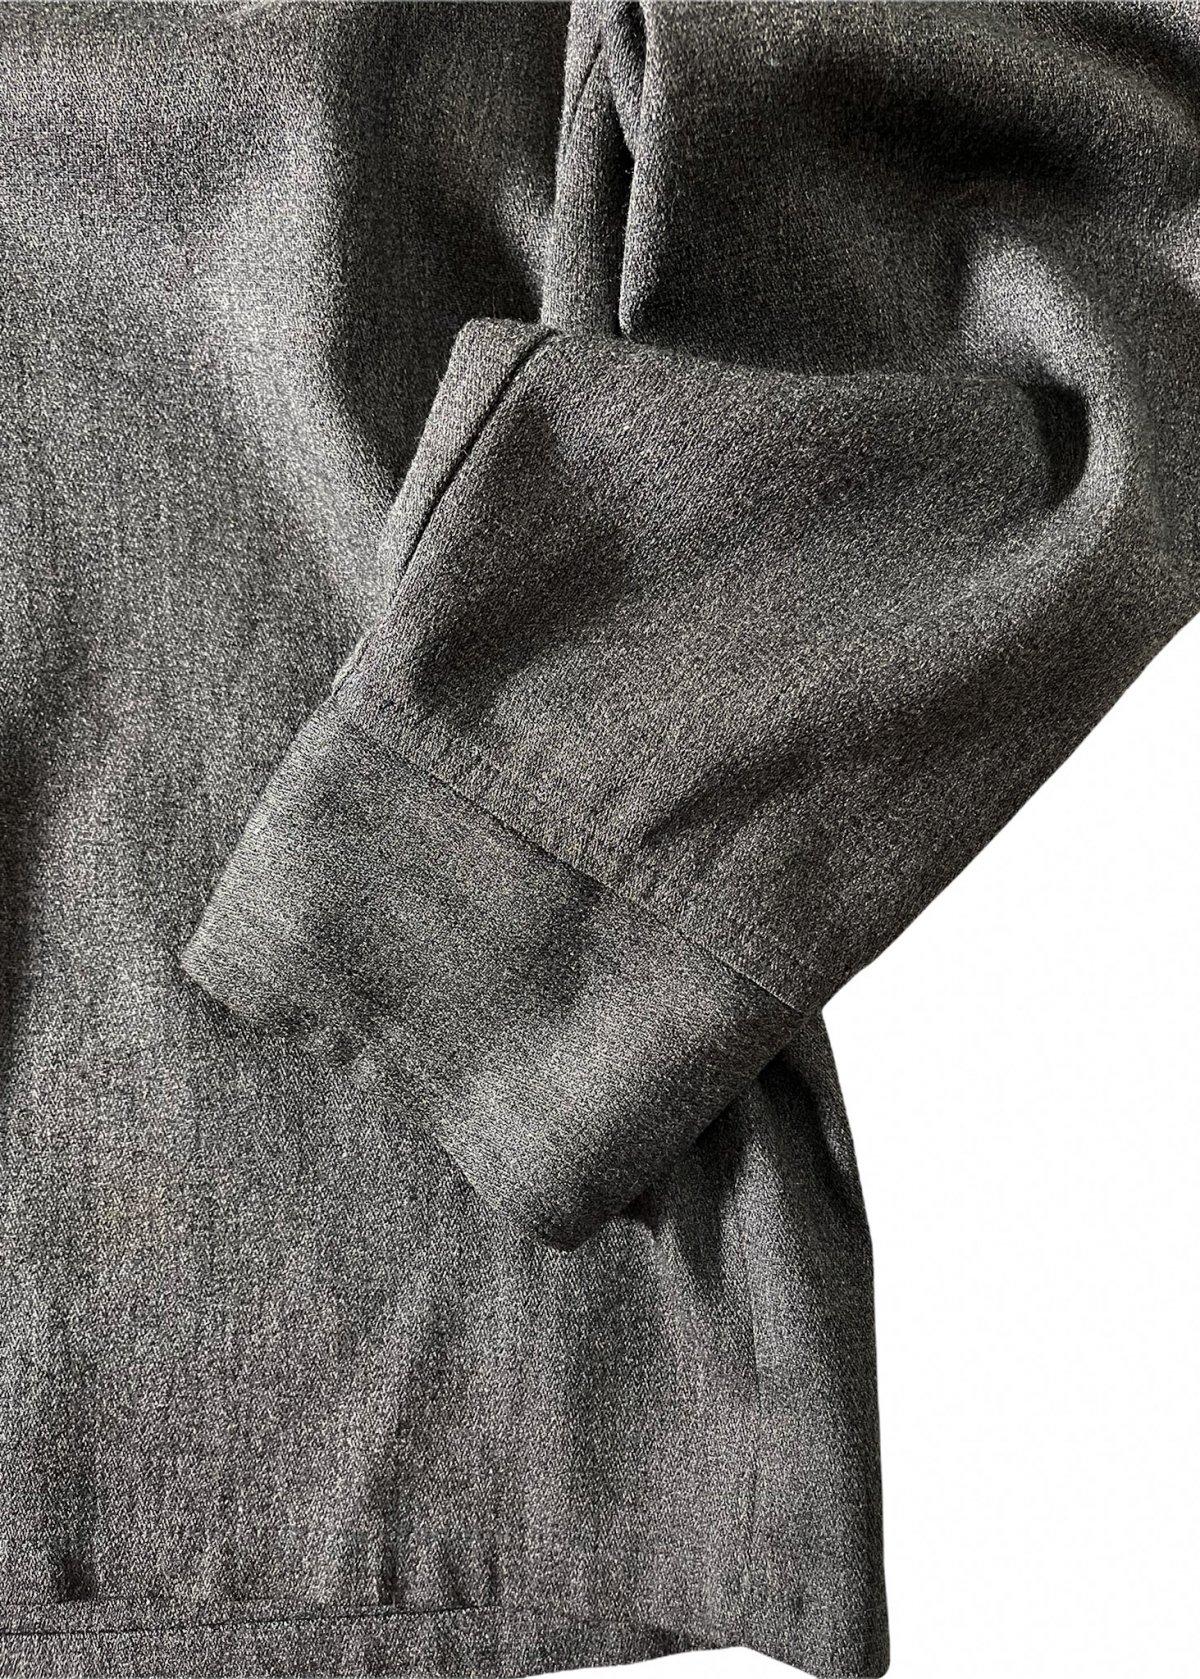 I&I 古着 通販 Vintage Wool Mix wide Shirt 詳細画像5